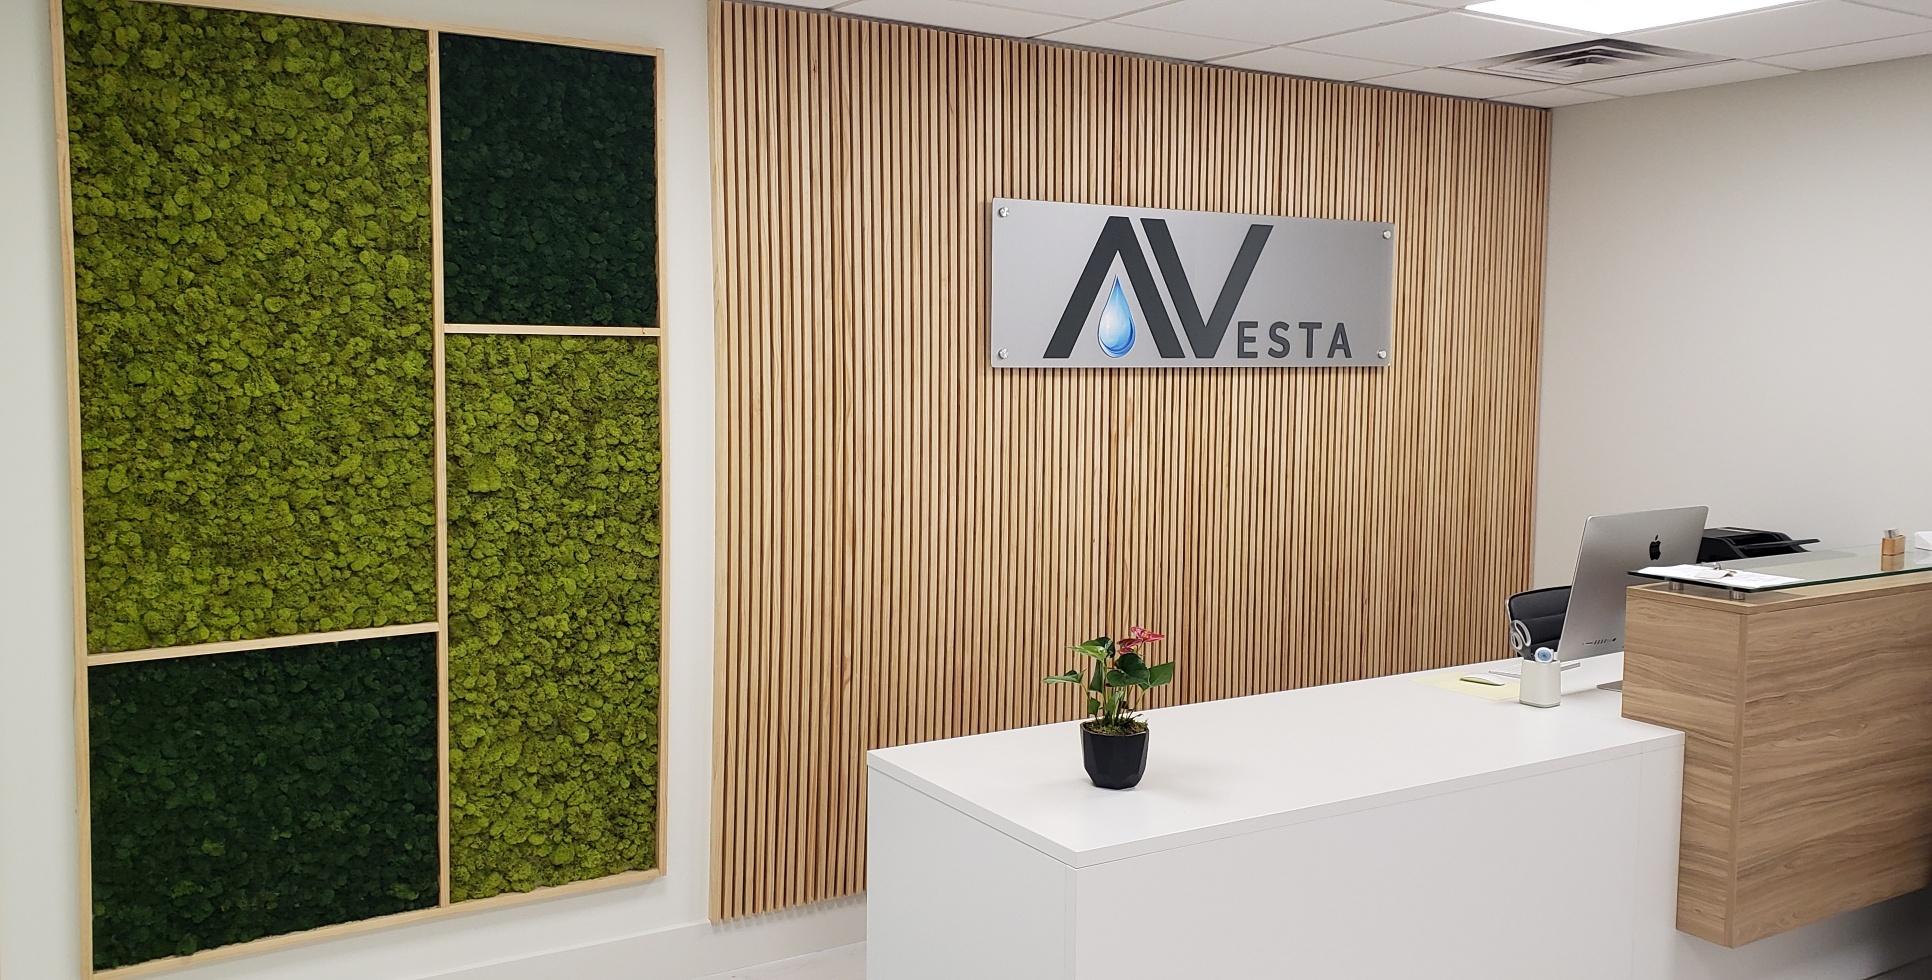 Avesta McLean Entrance